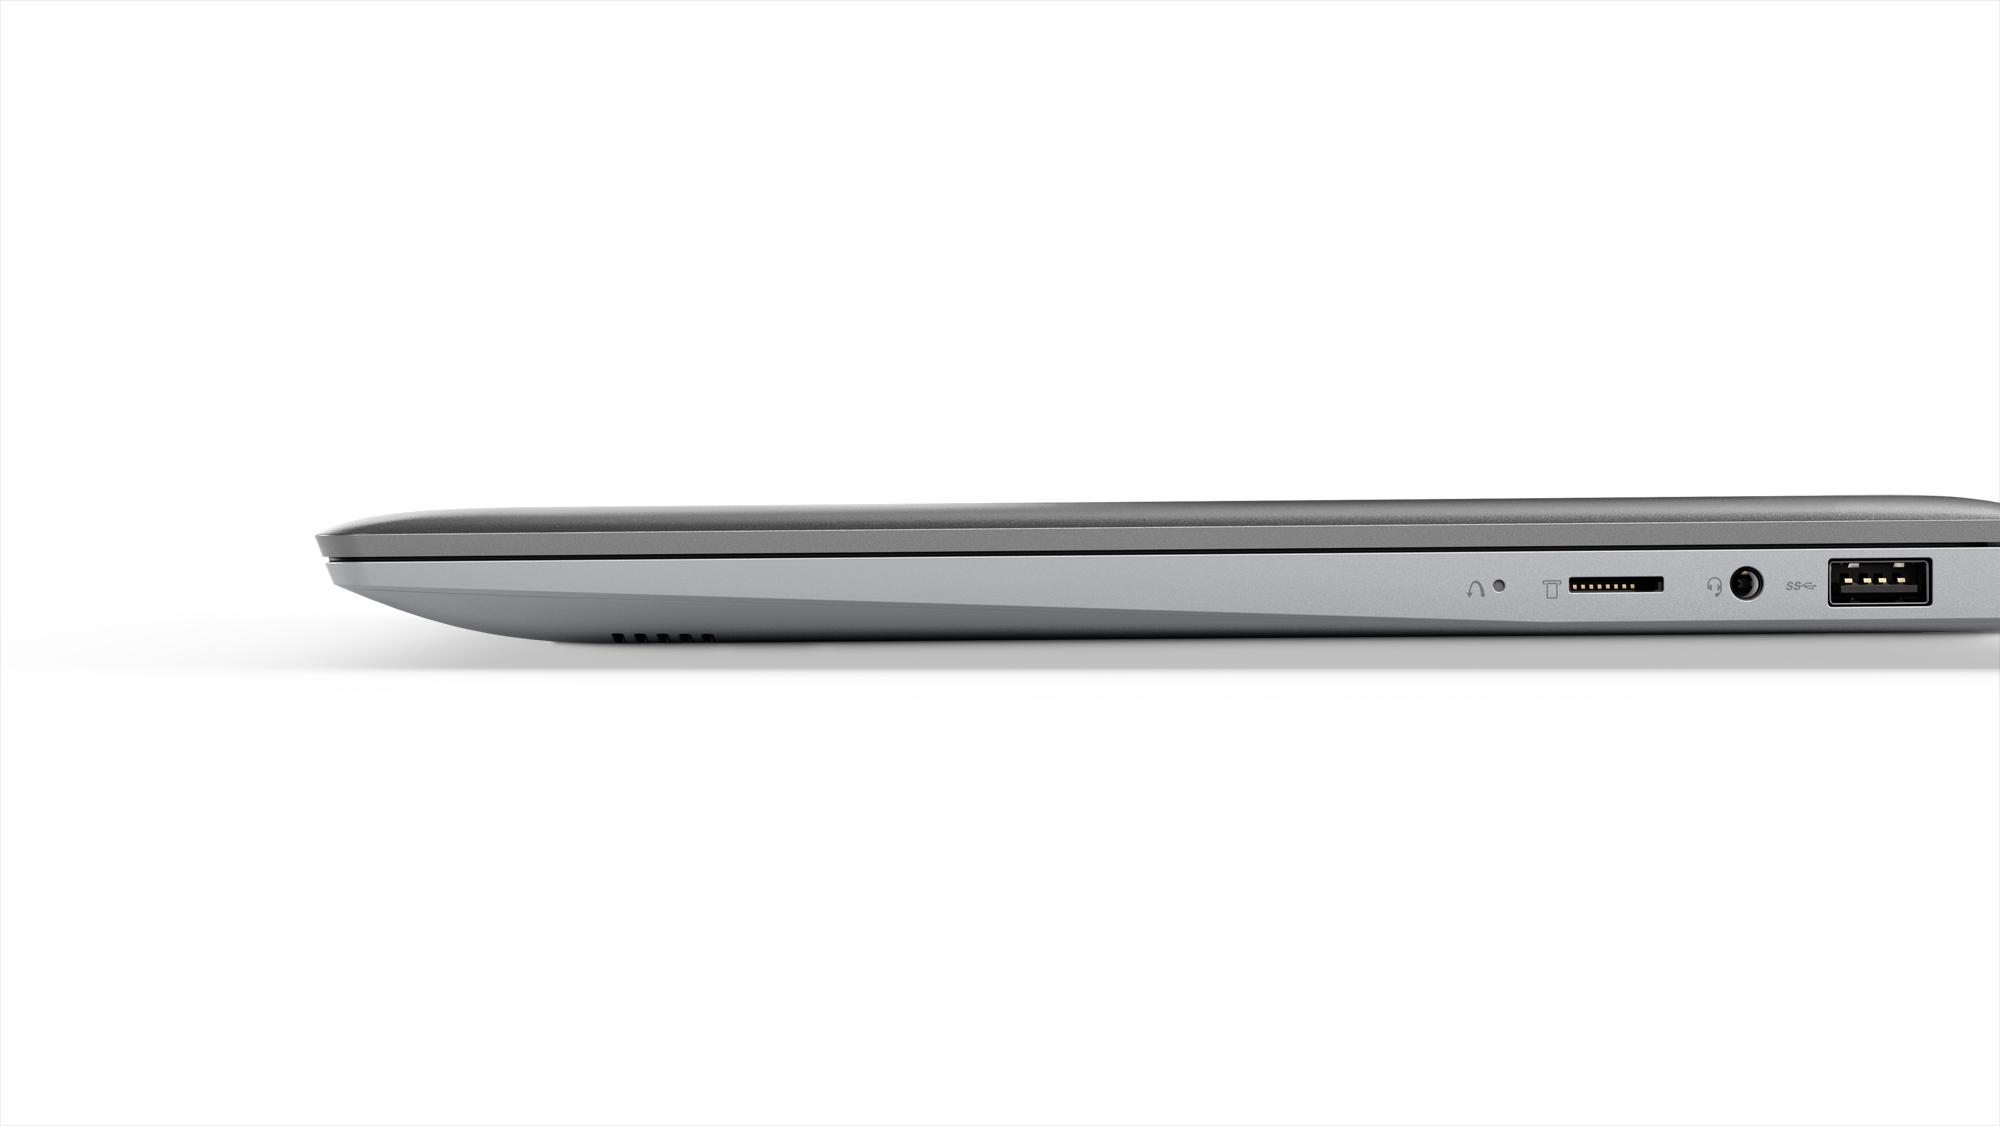 Фото  Ультрабук Lenovo ideapad 120S-14 Mineral Grey (81A500BPRA)